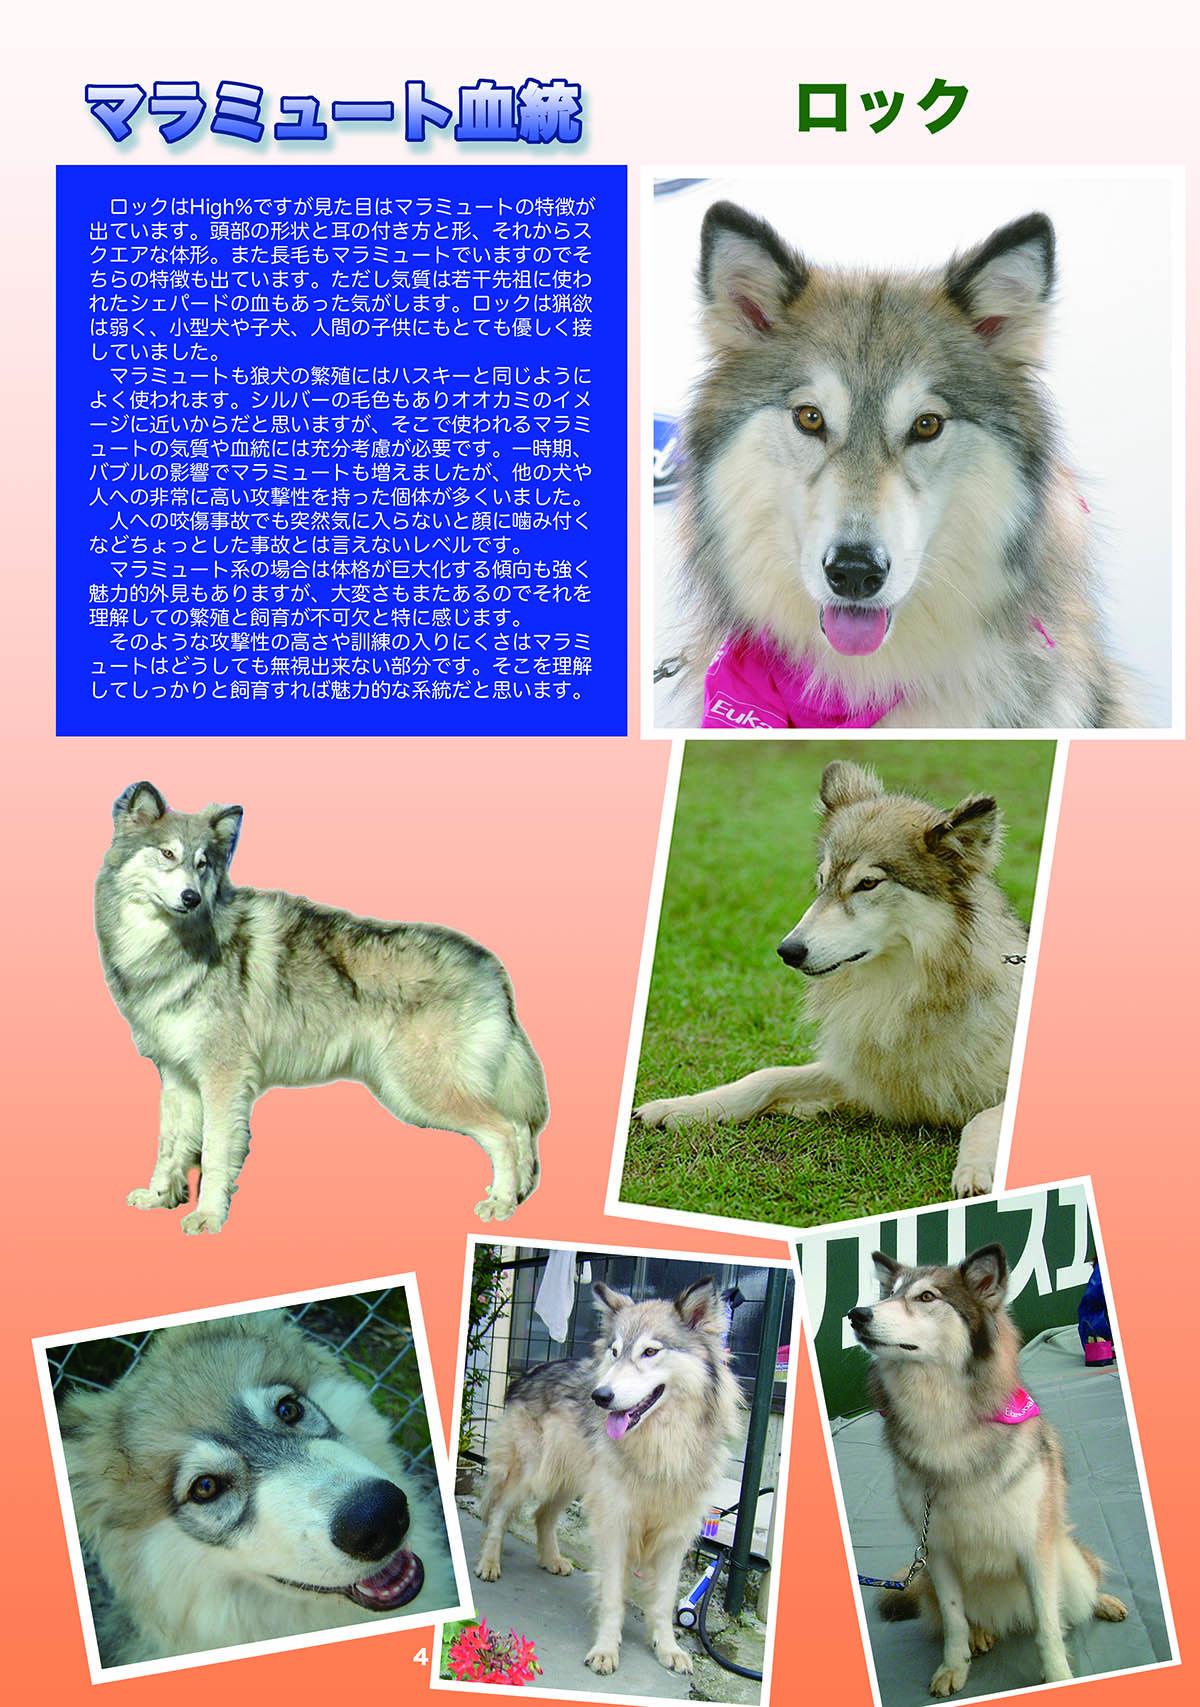 2016_SERIORS STORY 日本狼犬クラブ_05